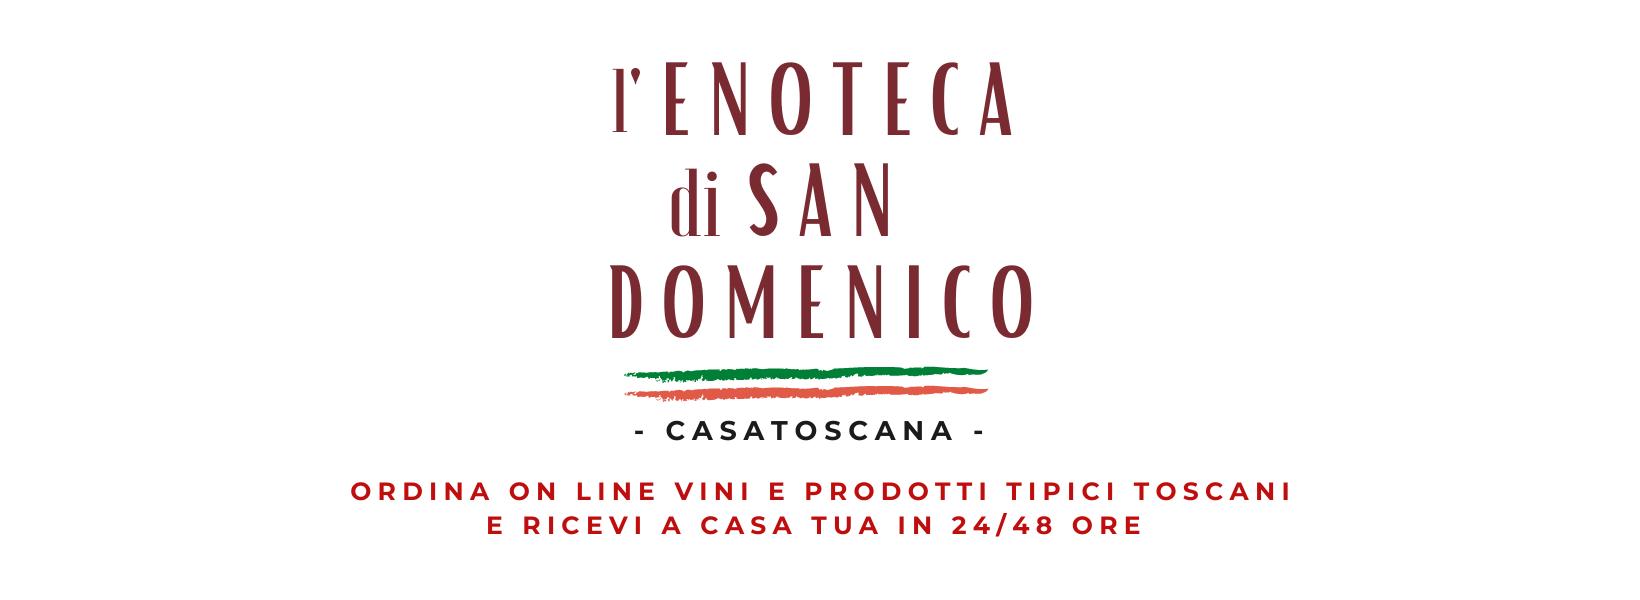 Enoteca di San Domenico Casatoscana